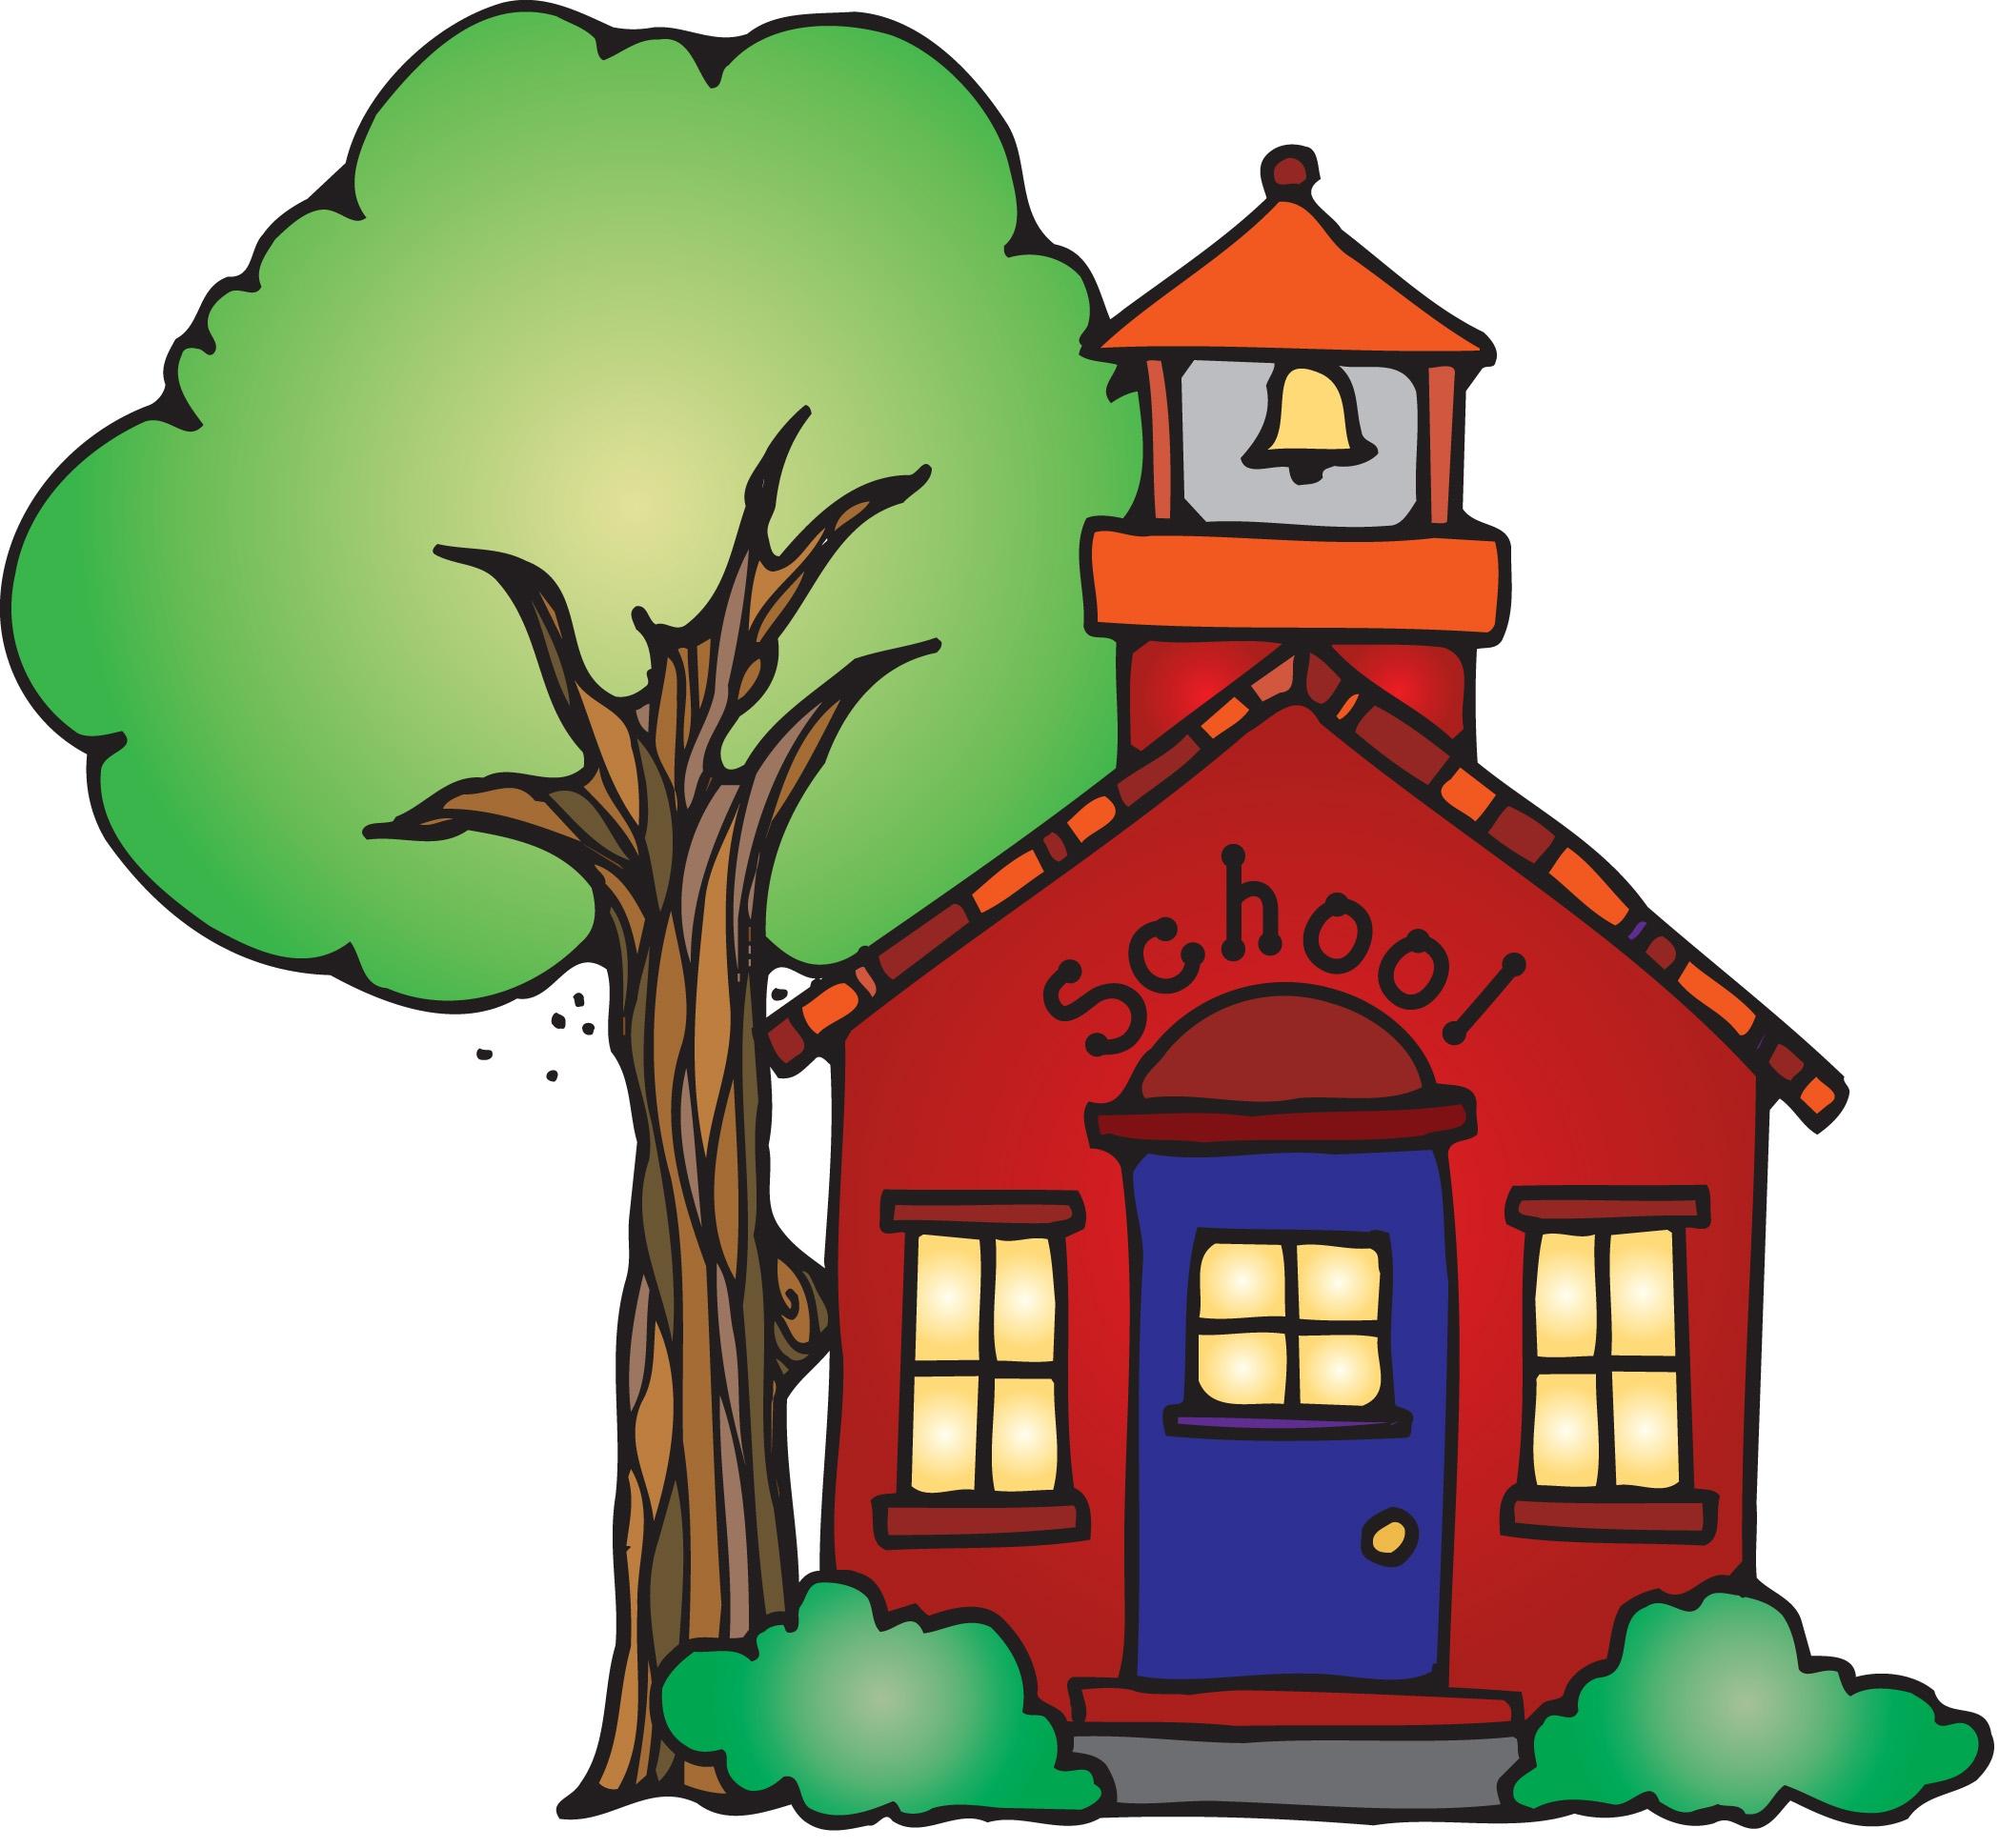 2098x1940 School House Clip Art, Free School House Clip Art